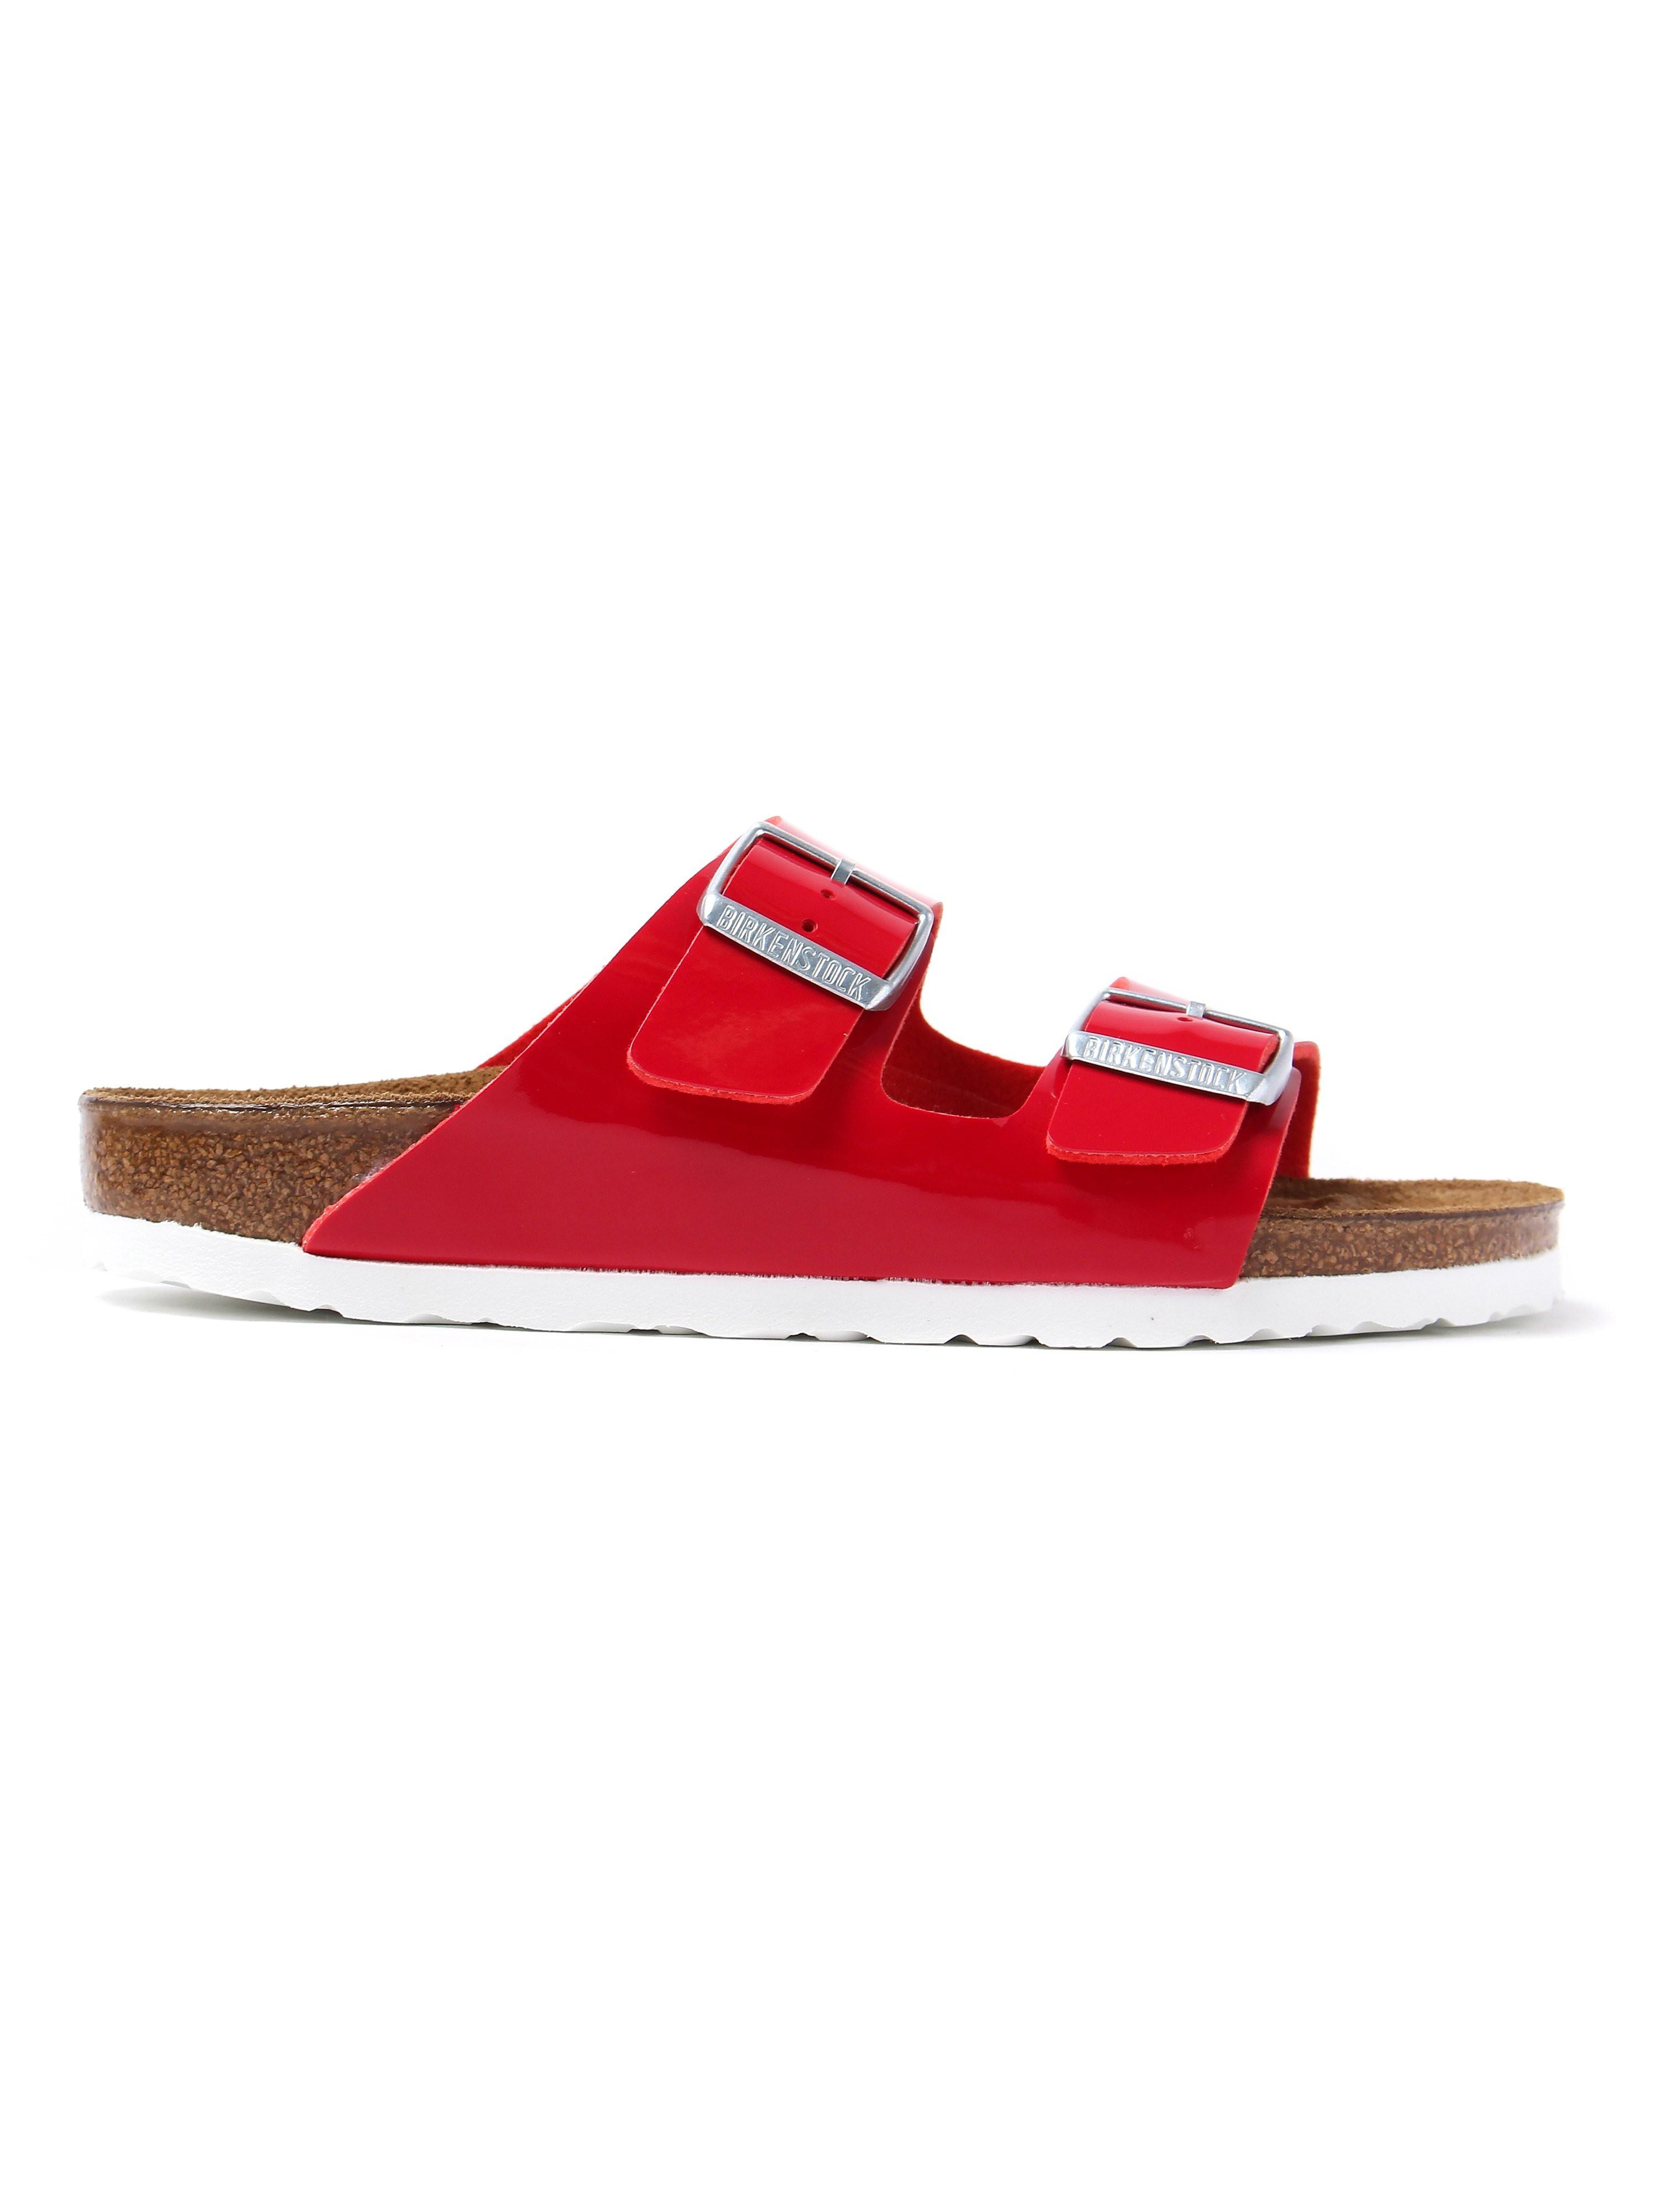 Birkenstock Women's Arizona Narrow Fit Sandals - Tango Red Patent Leather